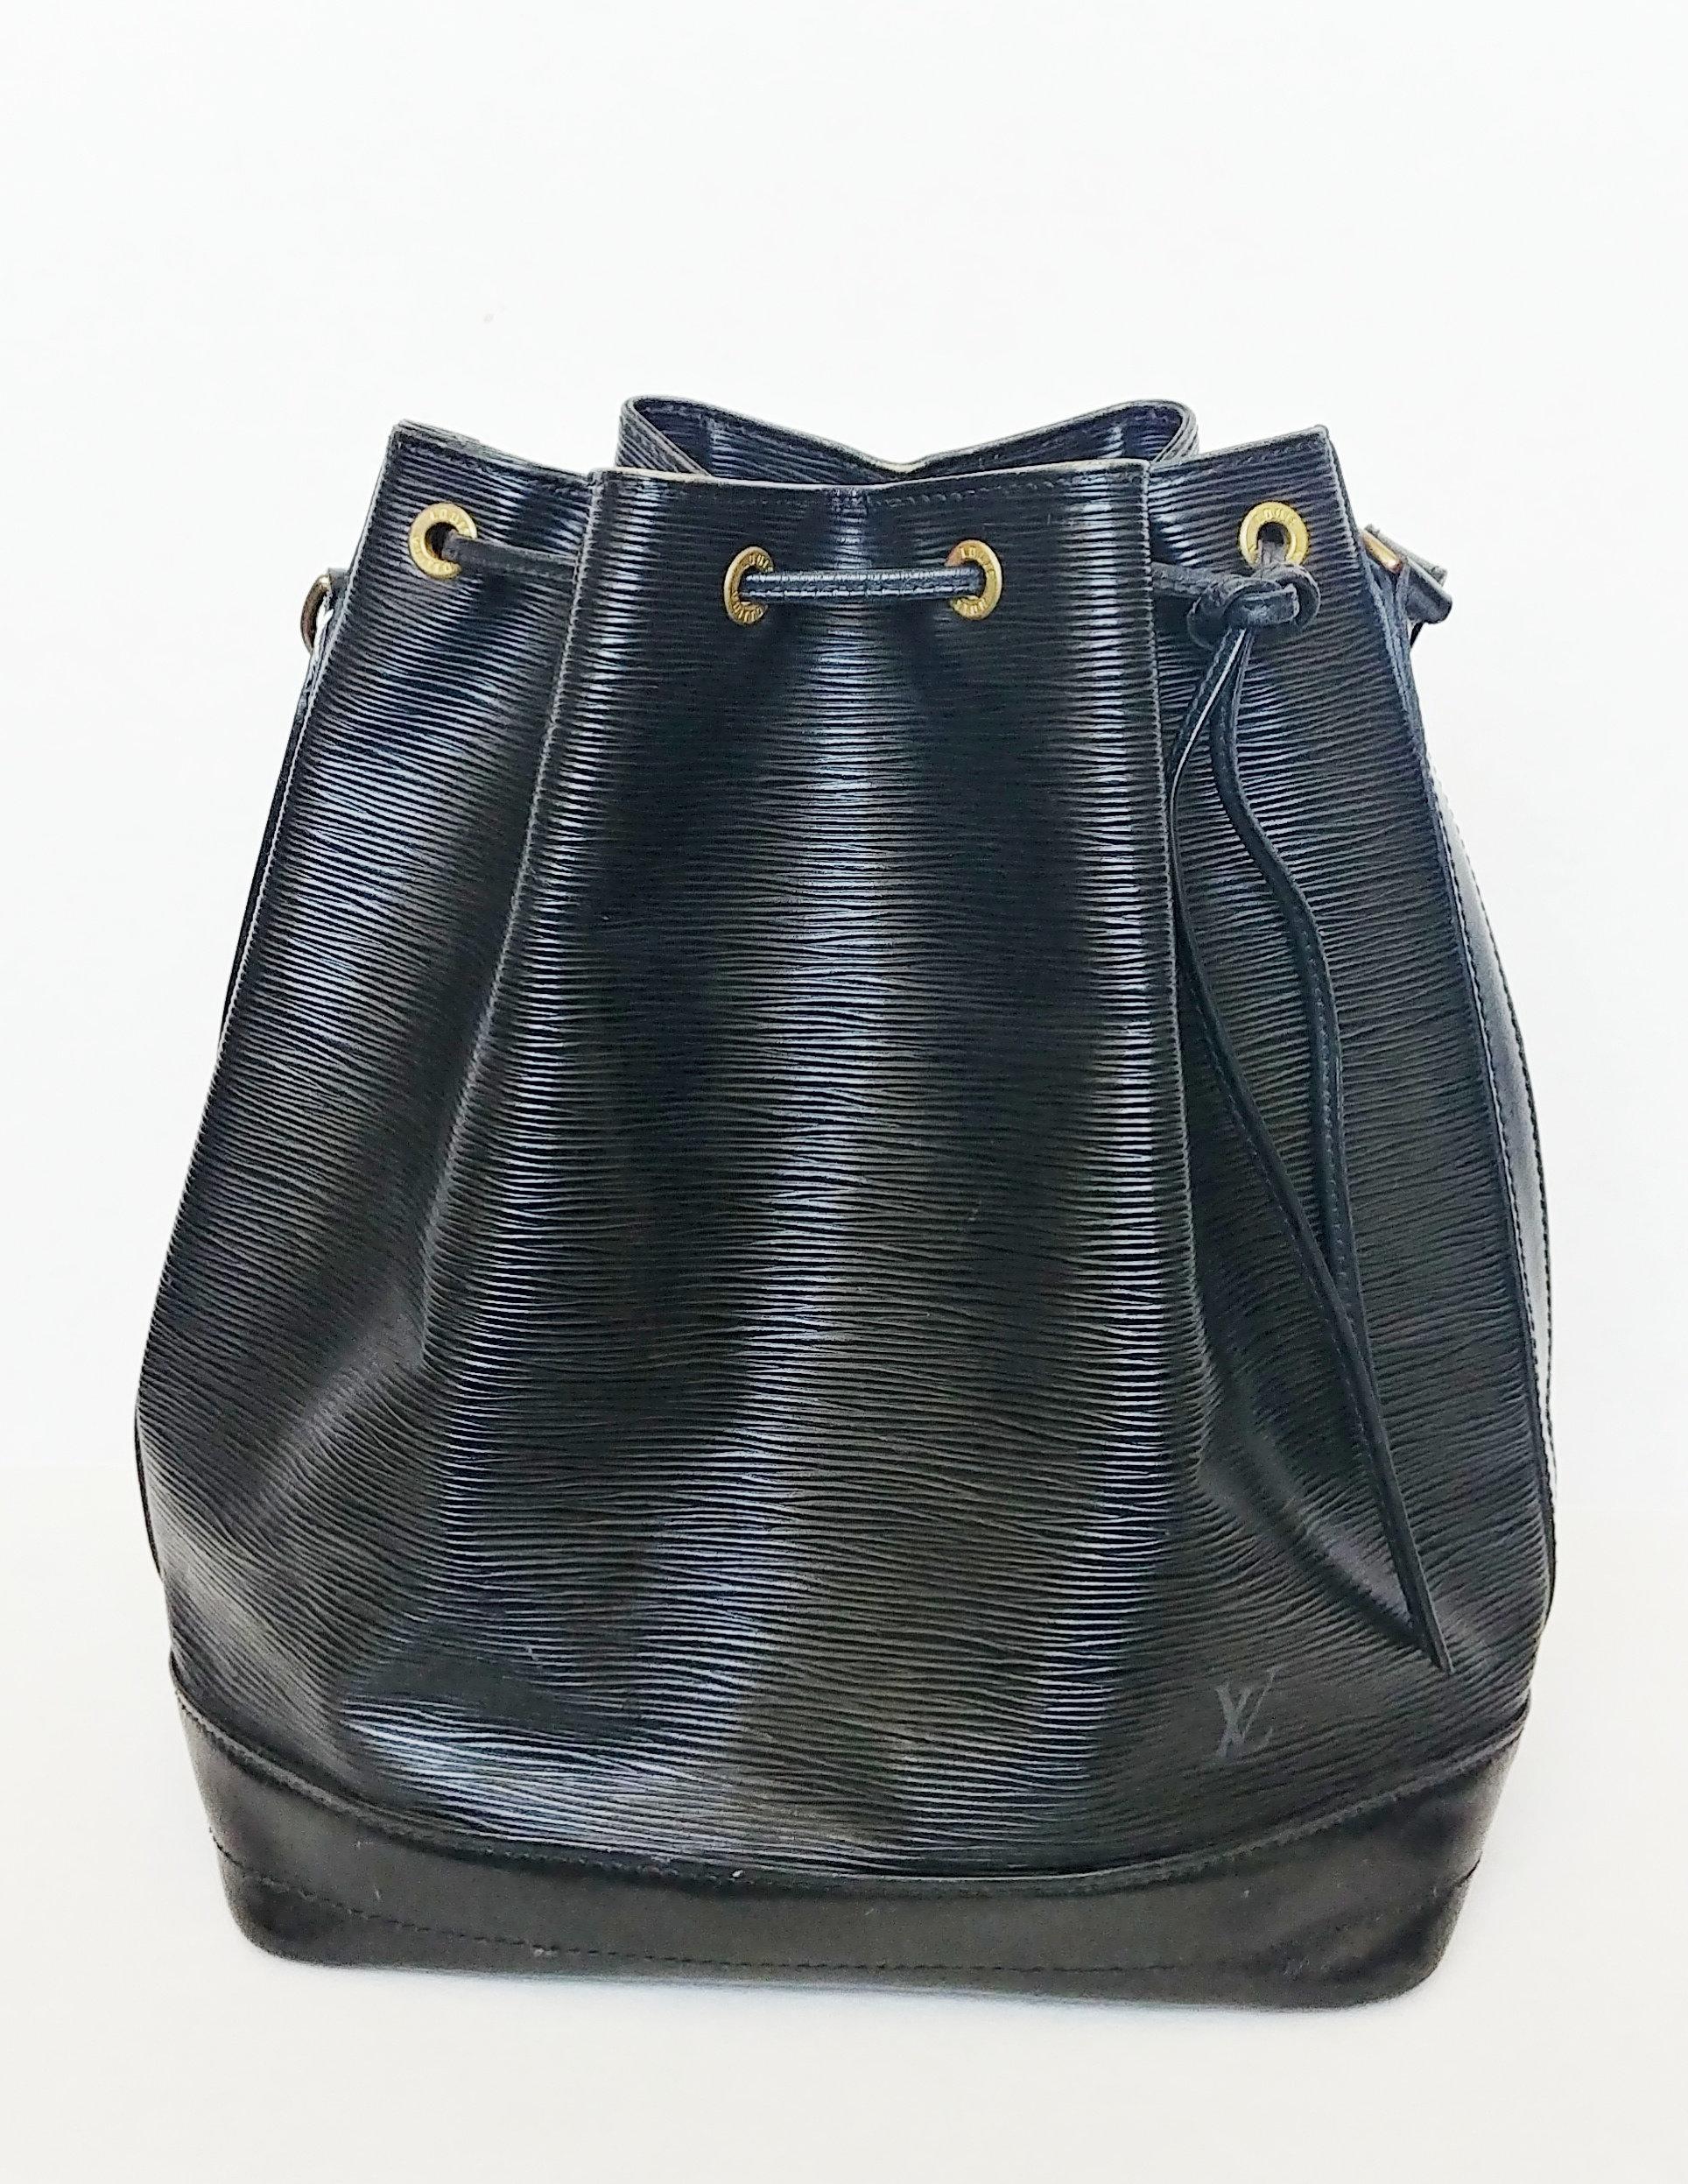 0e64a80647b Louis Vuitton Epi Leather Noe Black | hazelilly